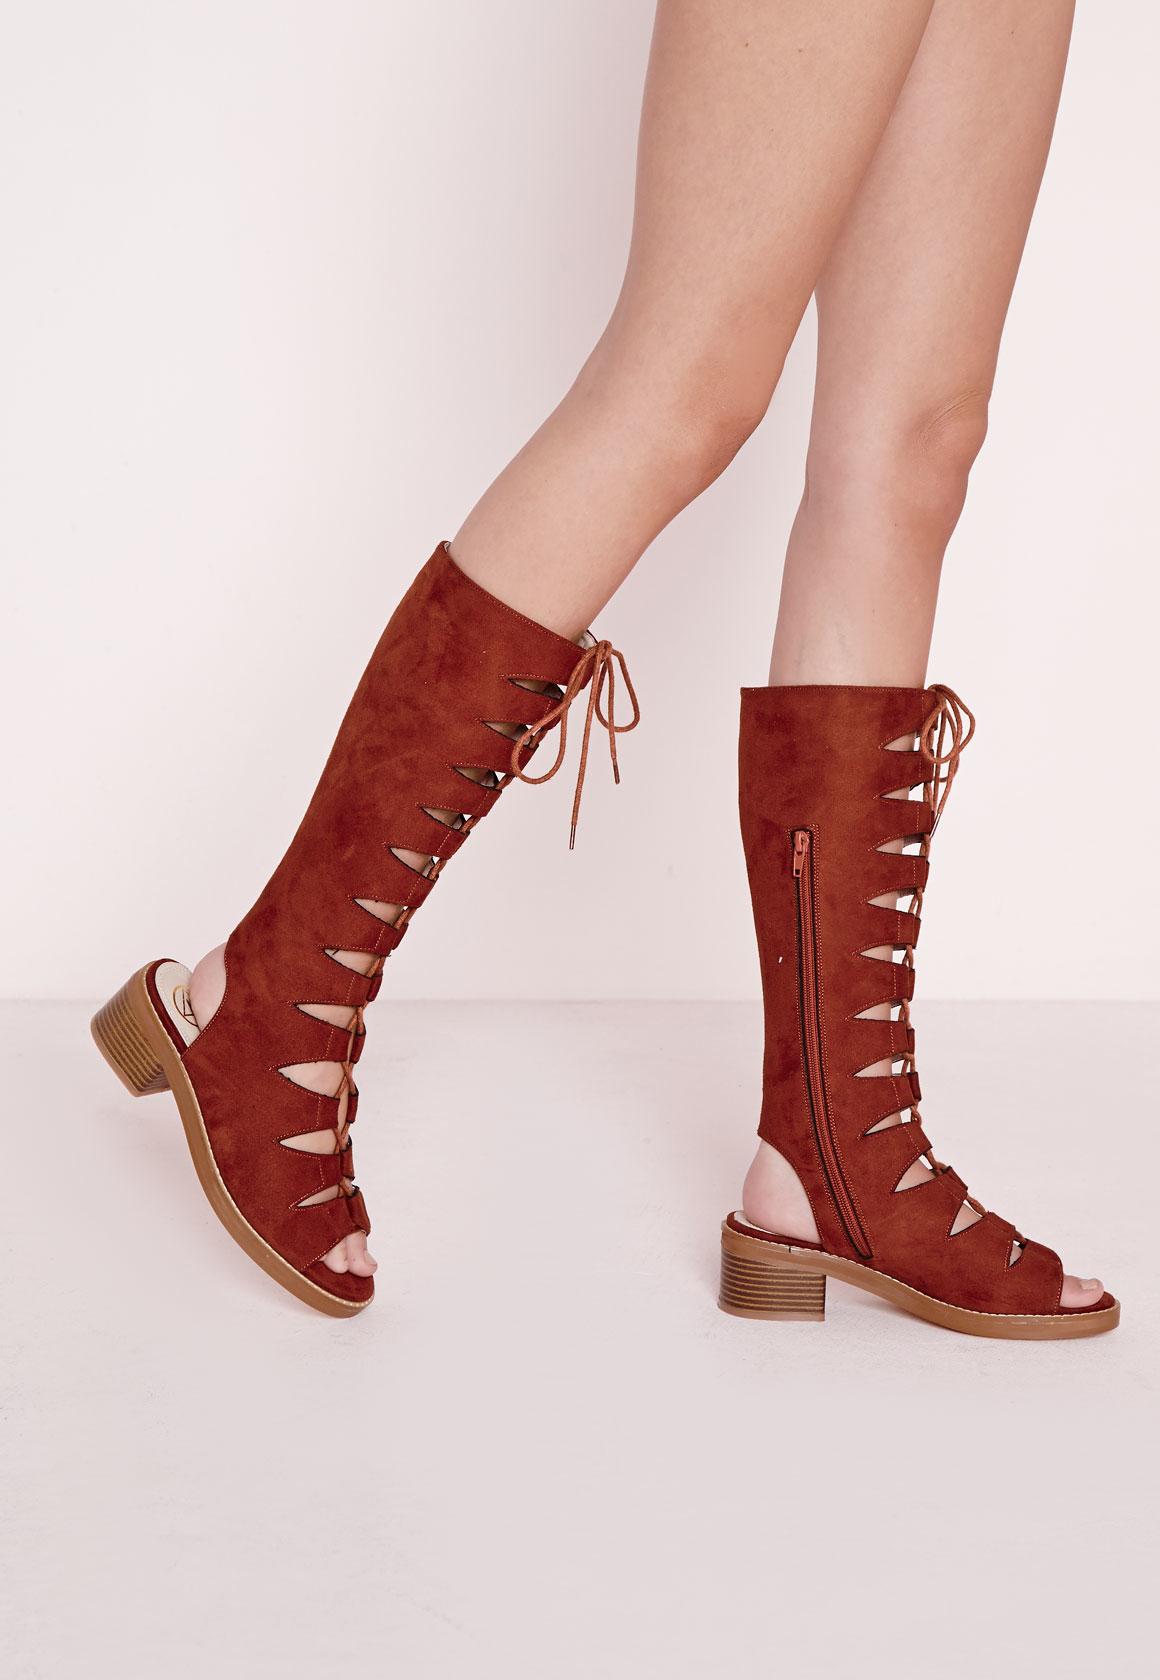 f0c995aff0c Missguided Mid Calf Gladiator Sandals Rust in Red - Lyst